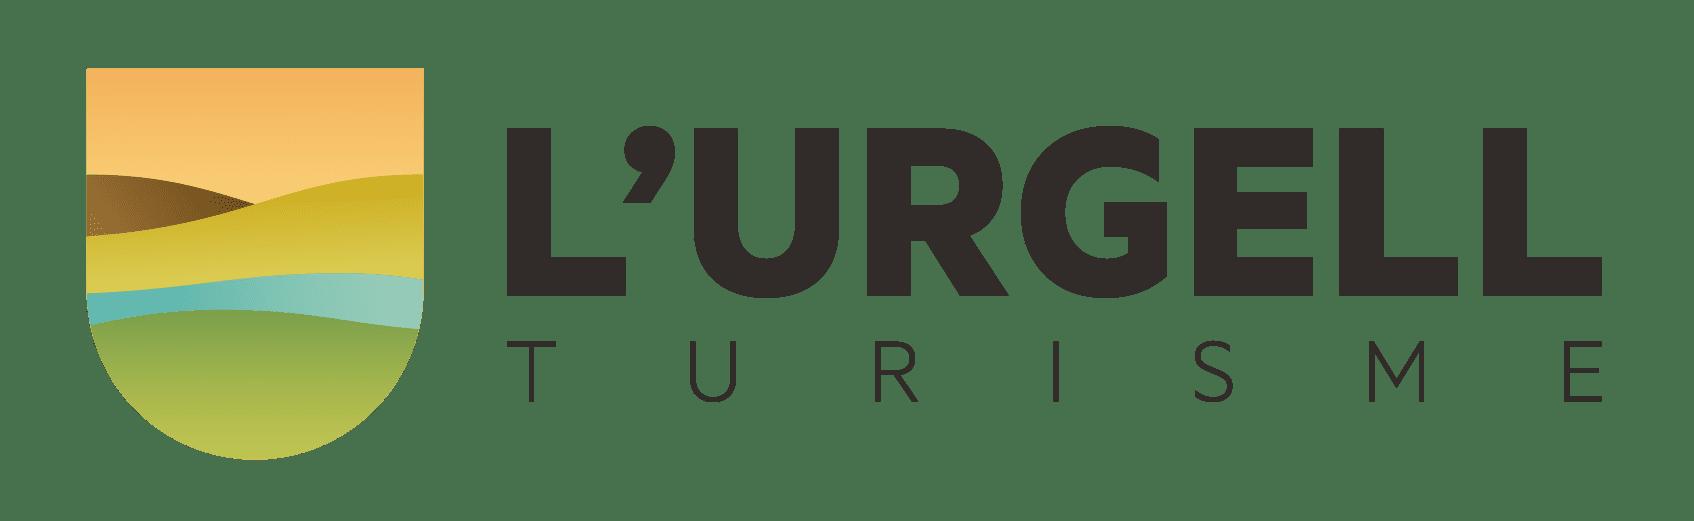 Turisme Urgell